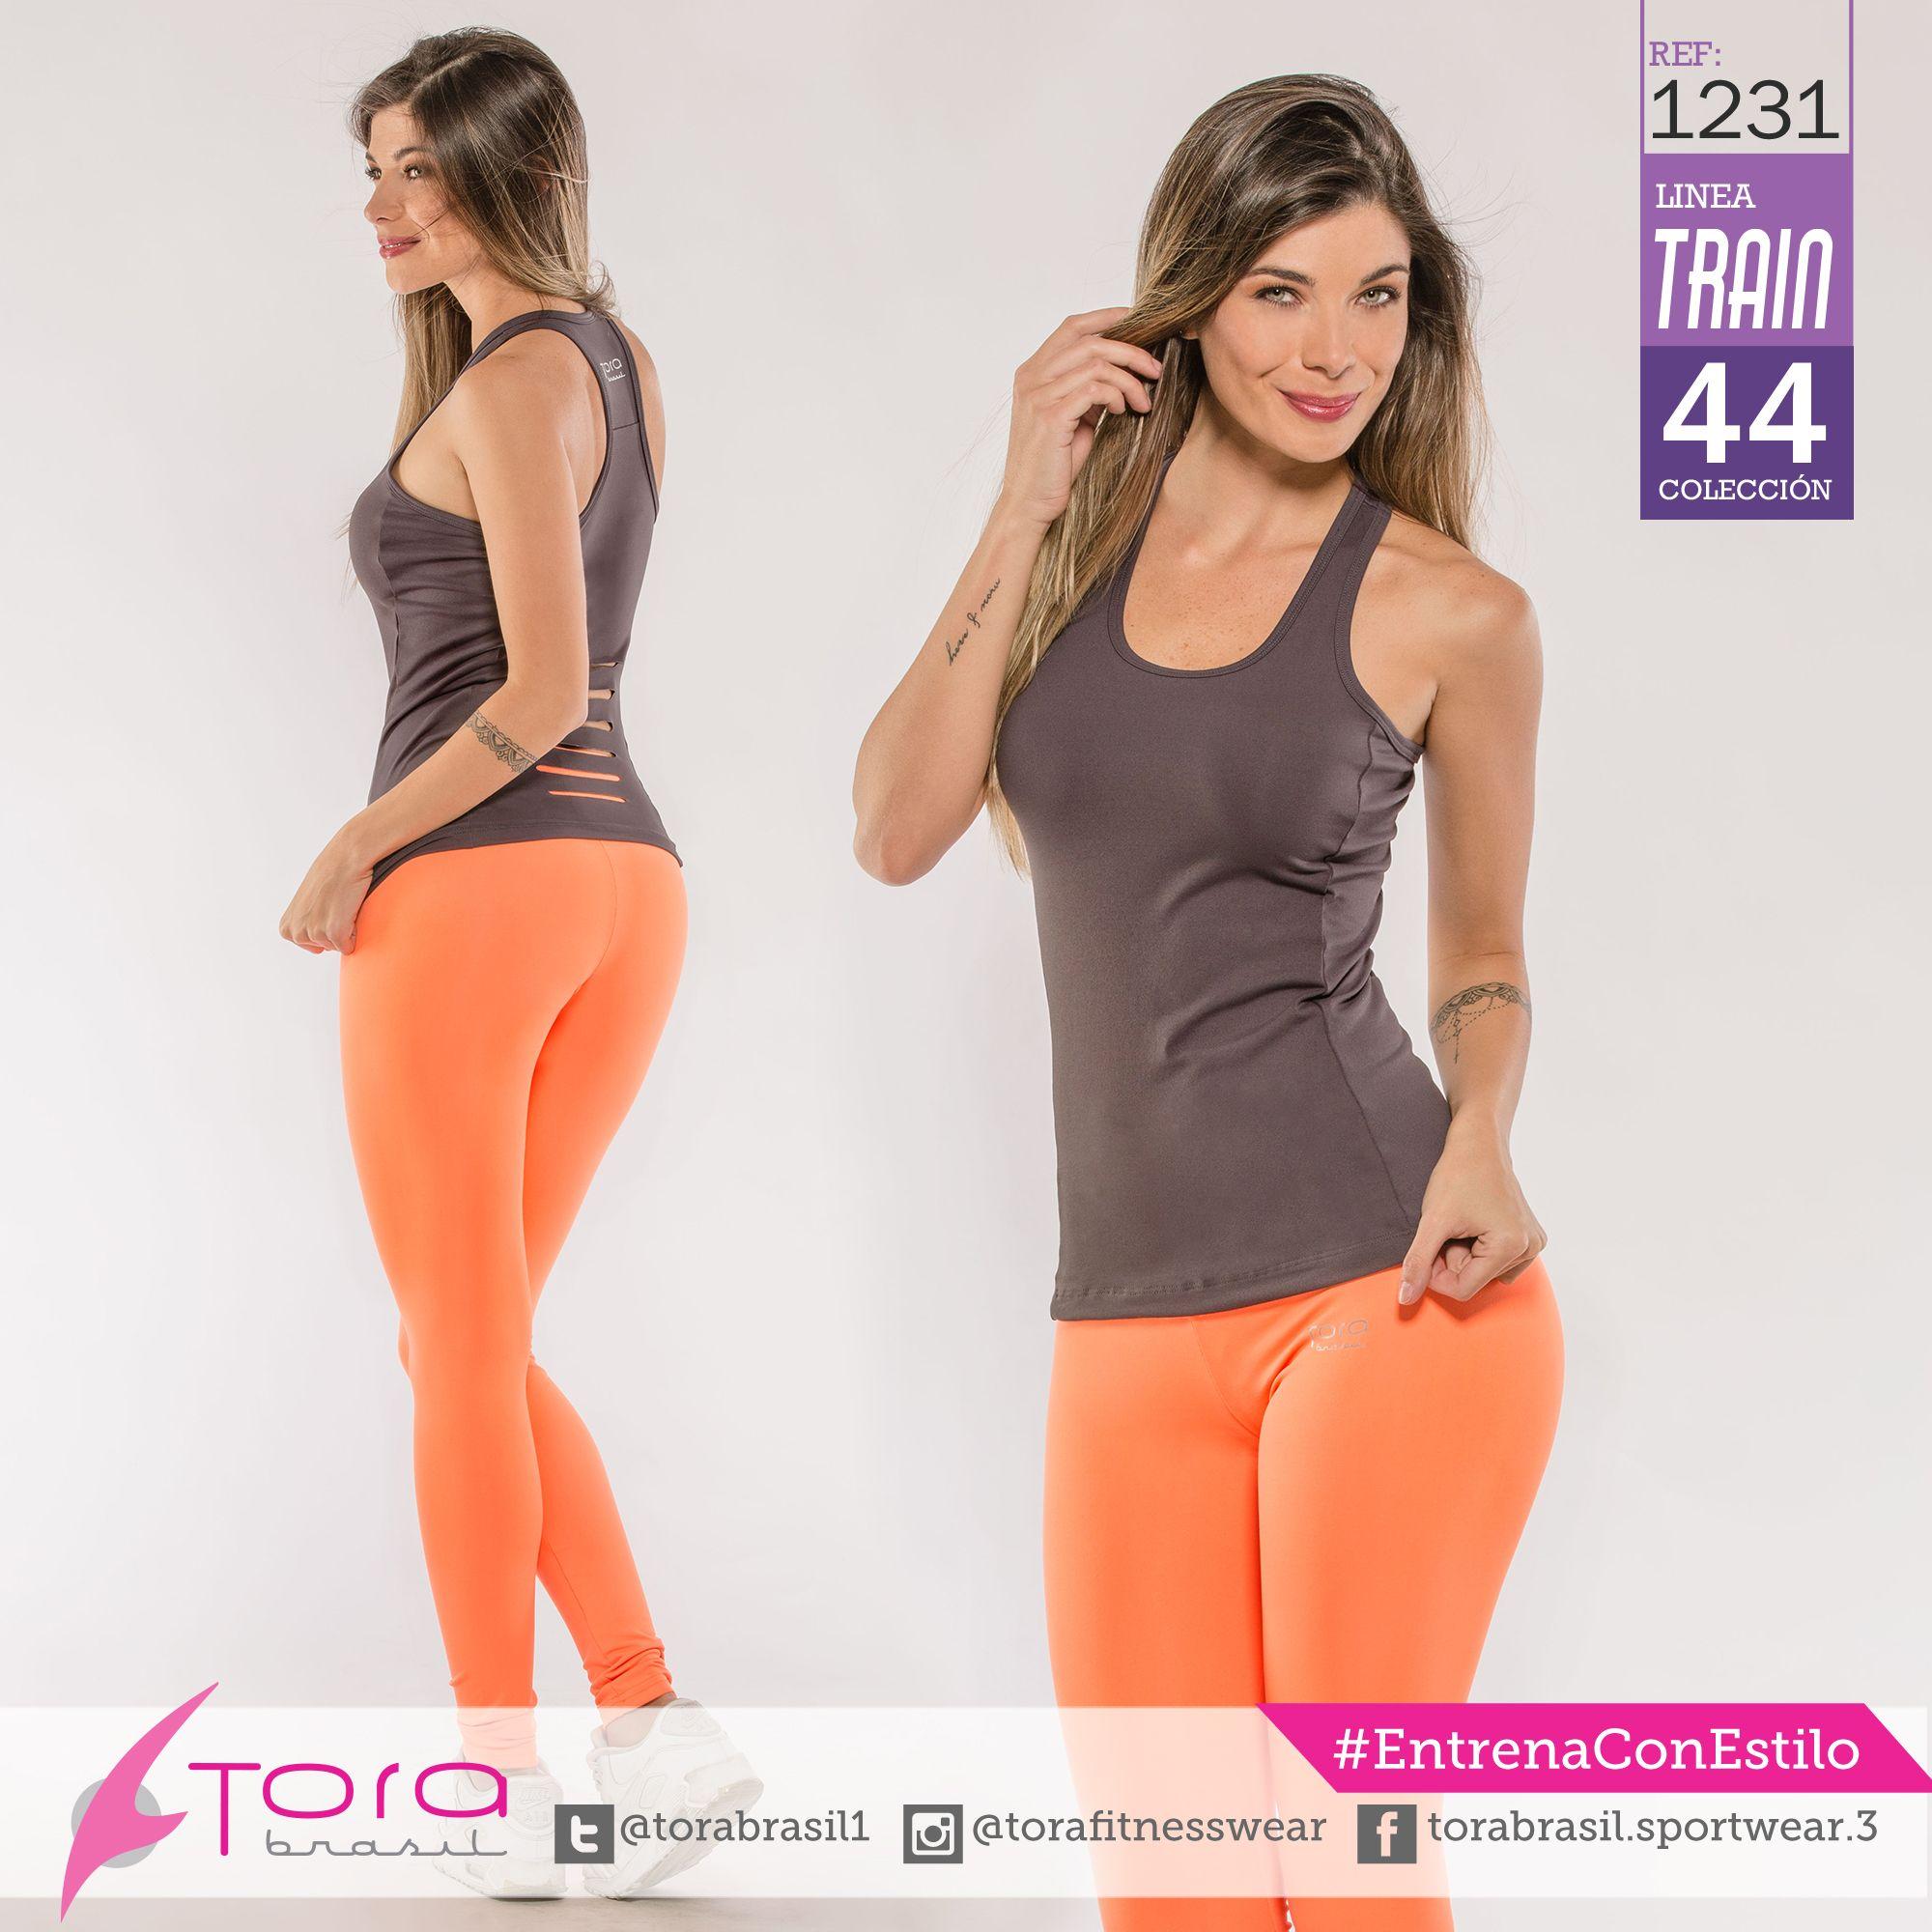 REF:1231  Leggings y blusa, unitalla #EntrenaConEstilo #FitnessFashion #Leggings #ToraBrasil #modadeportiva #gymwear